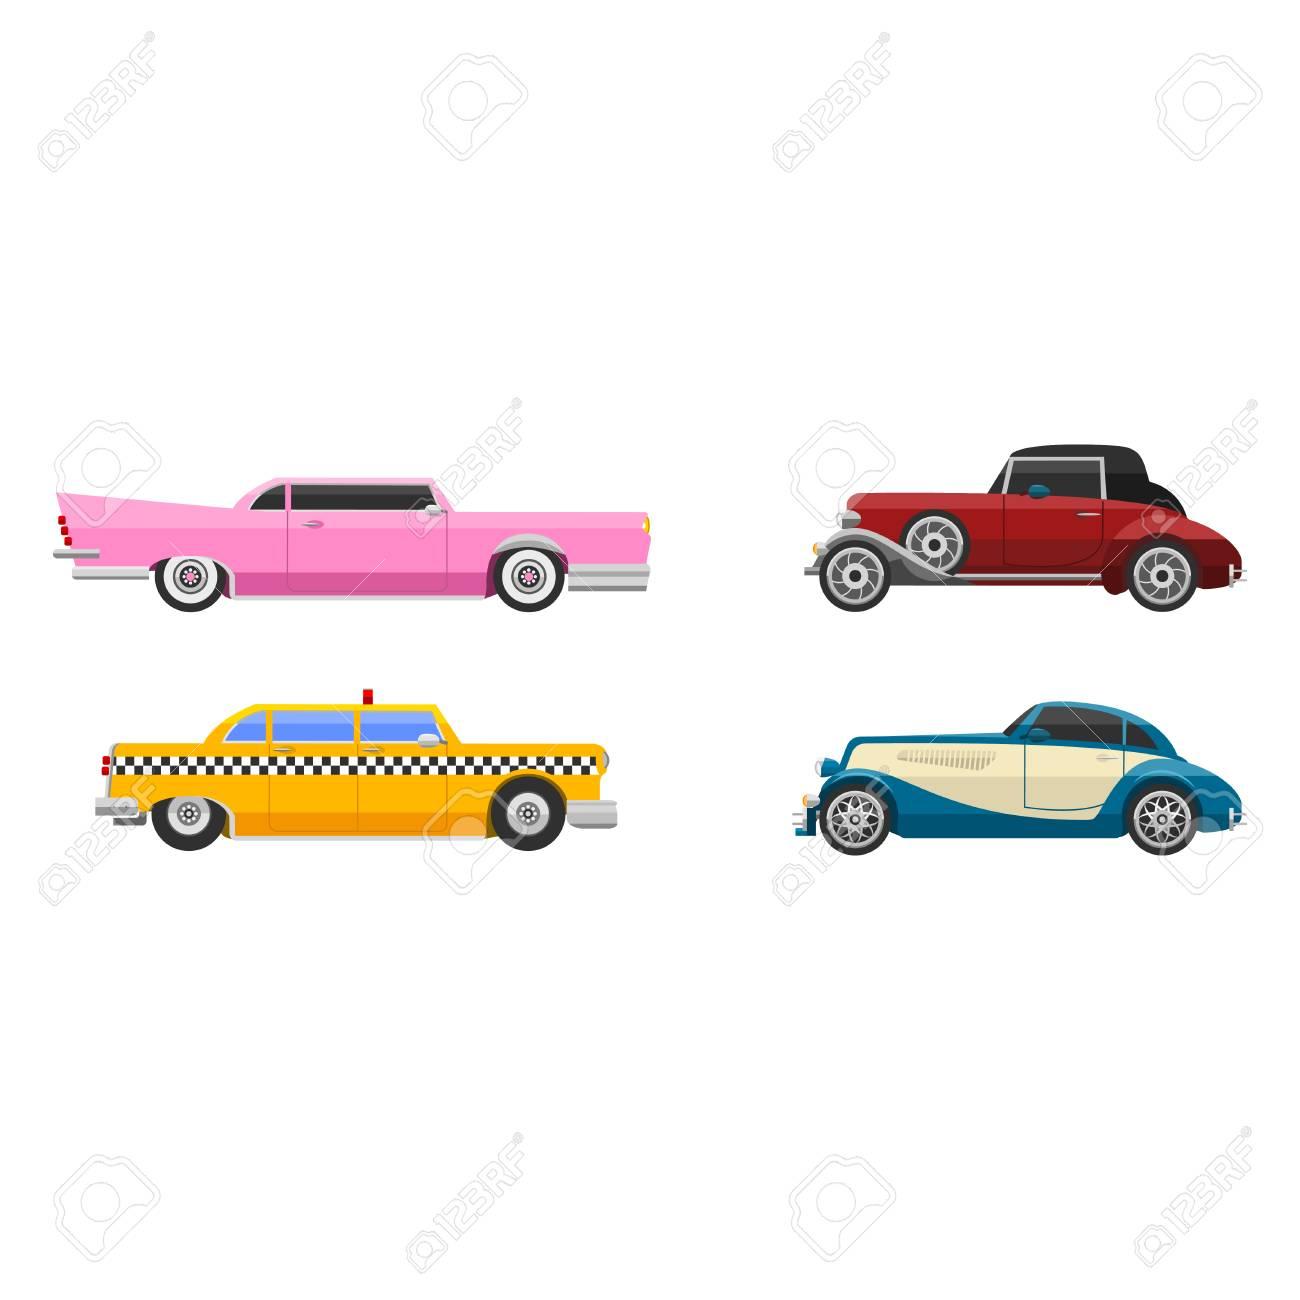 Retro car vehicle. - 69017549